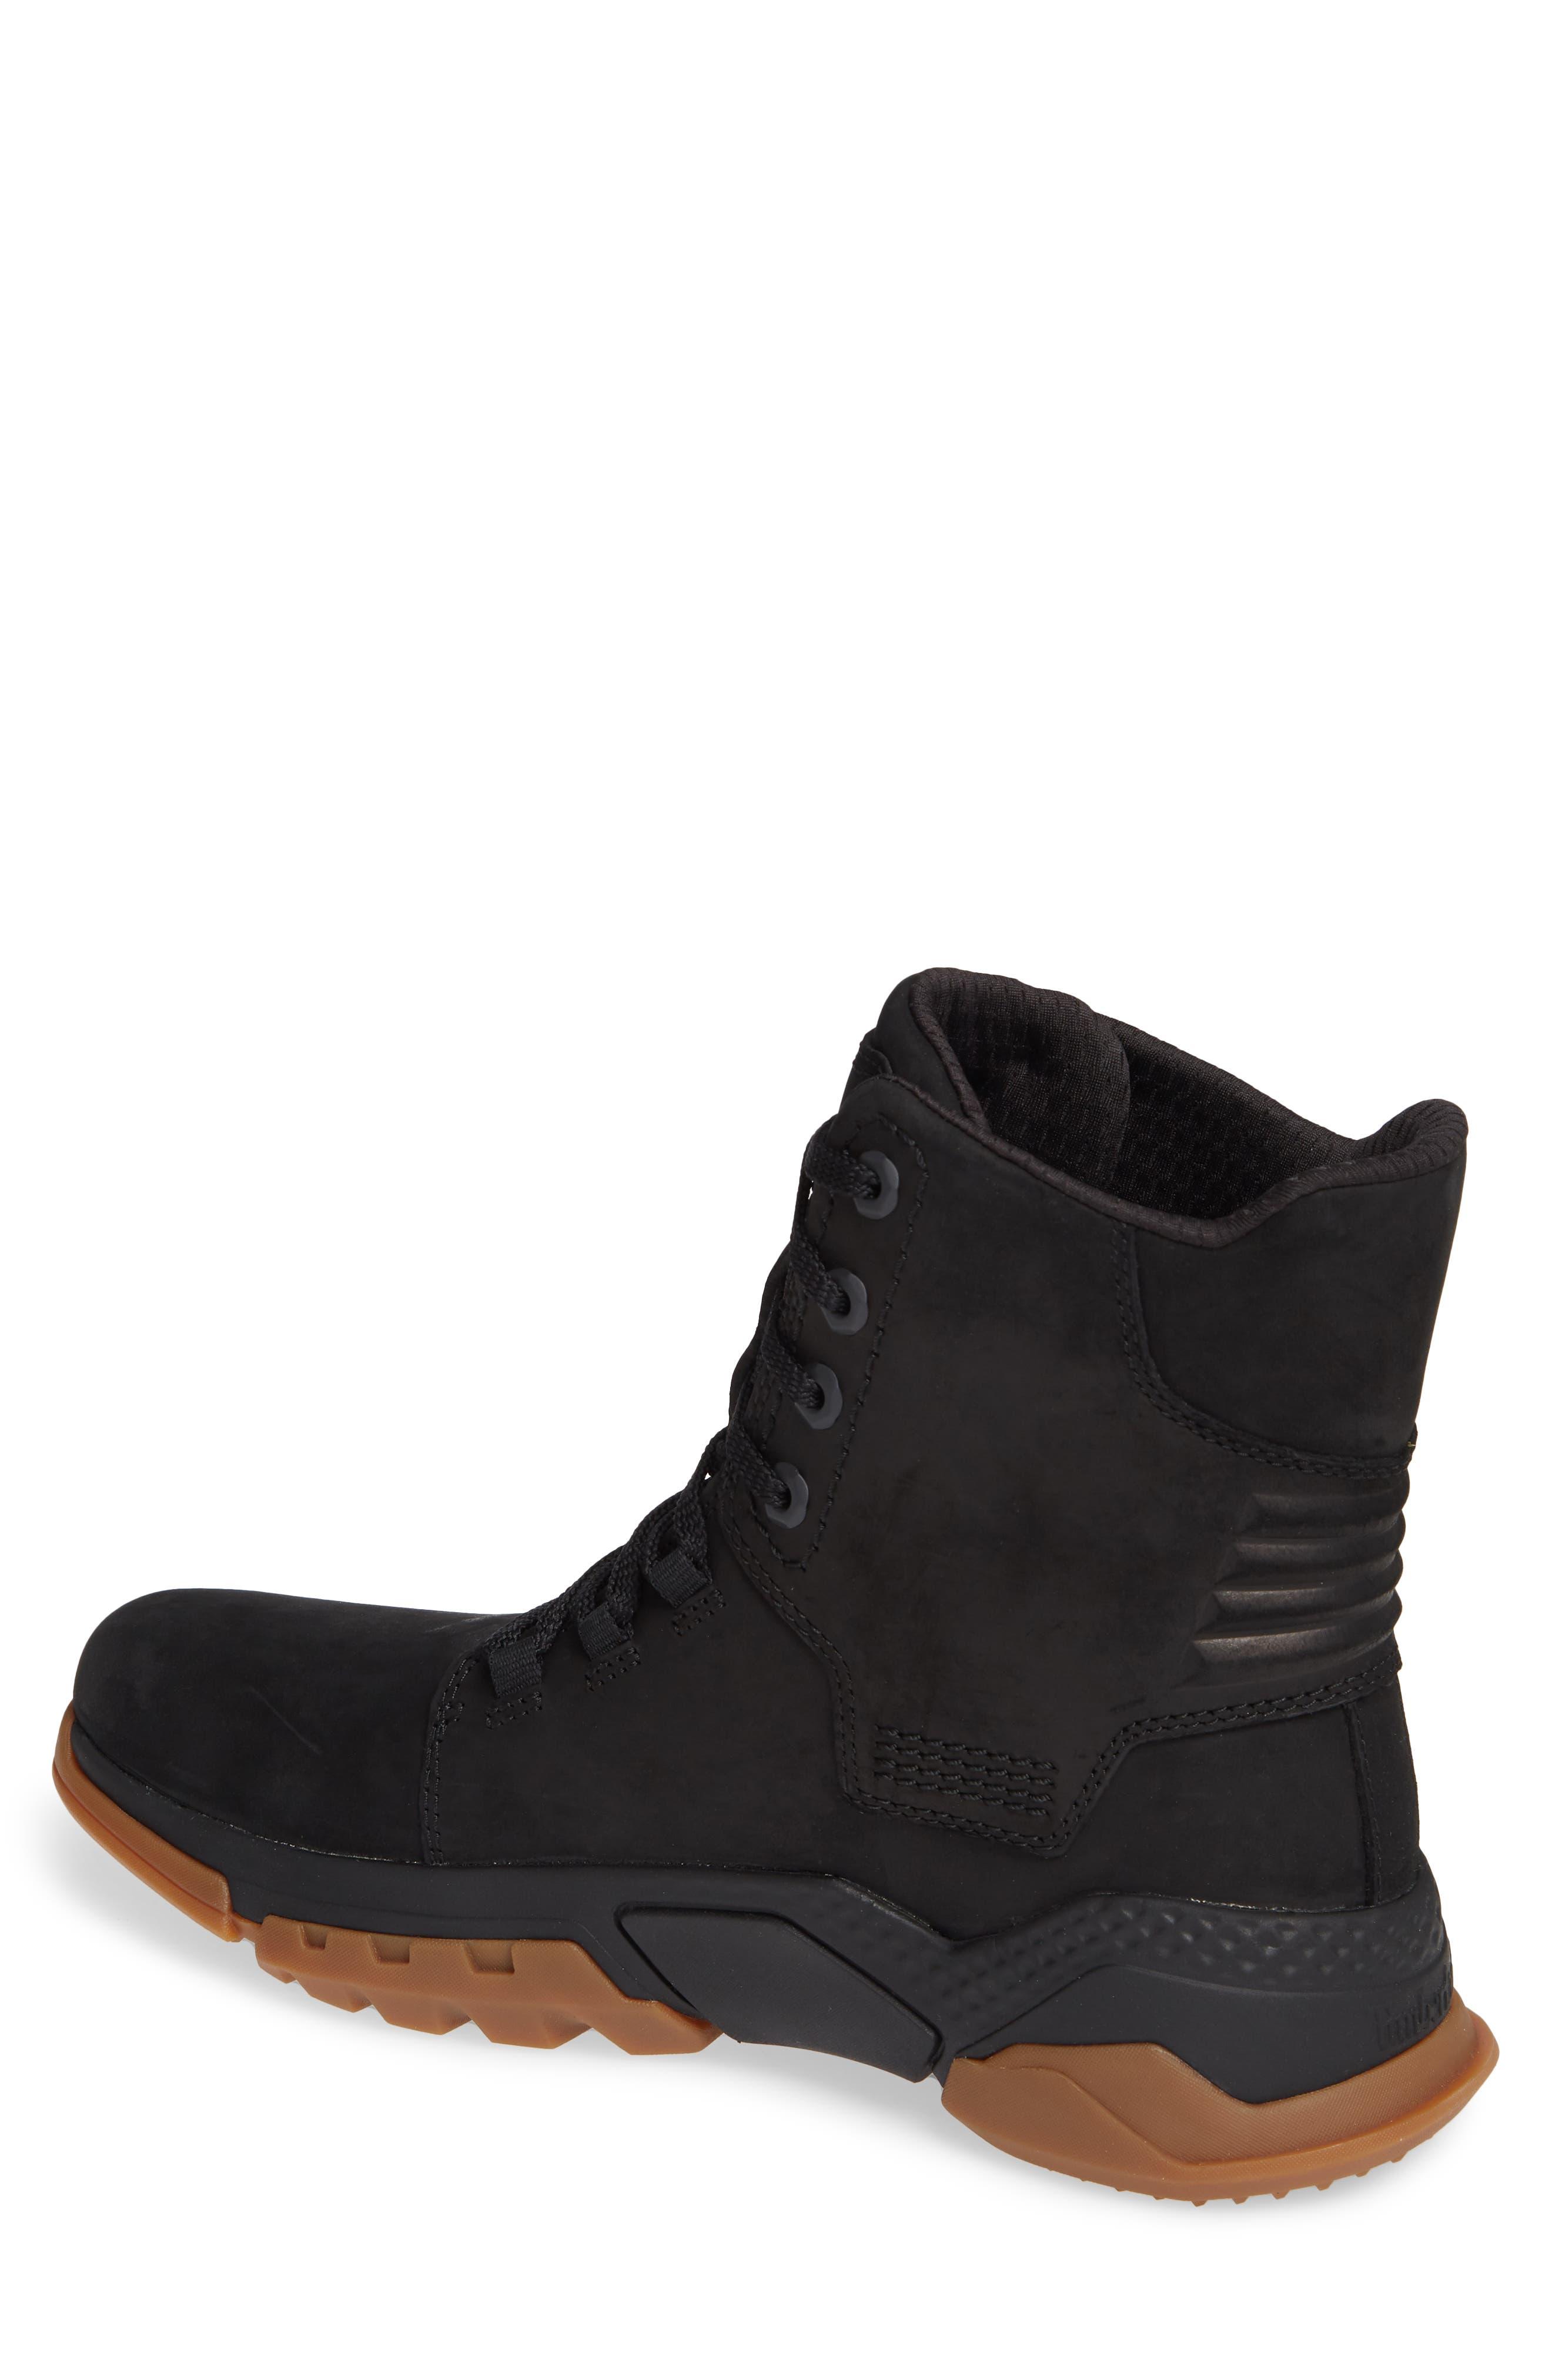 City Force Reveal Plain Toe Boot,                             Alternate thumbnail 2, color,                             BLACK LEATHER/ NEOPRENE